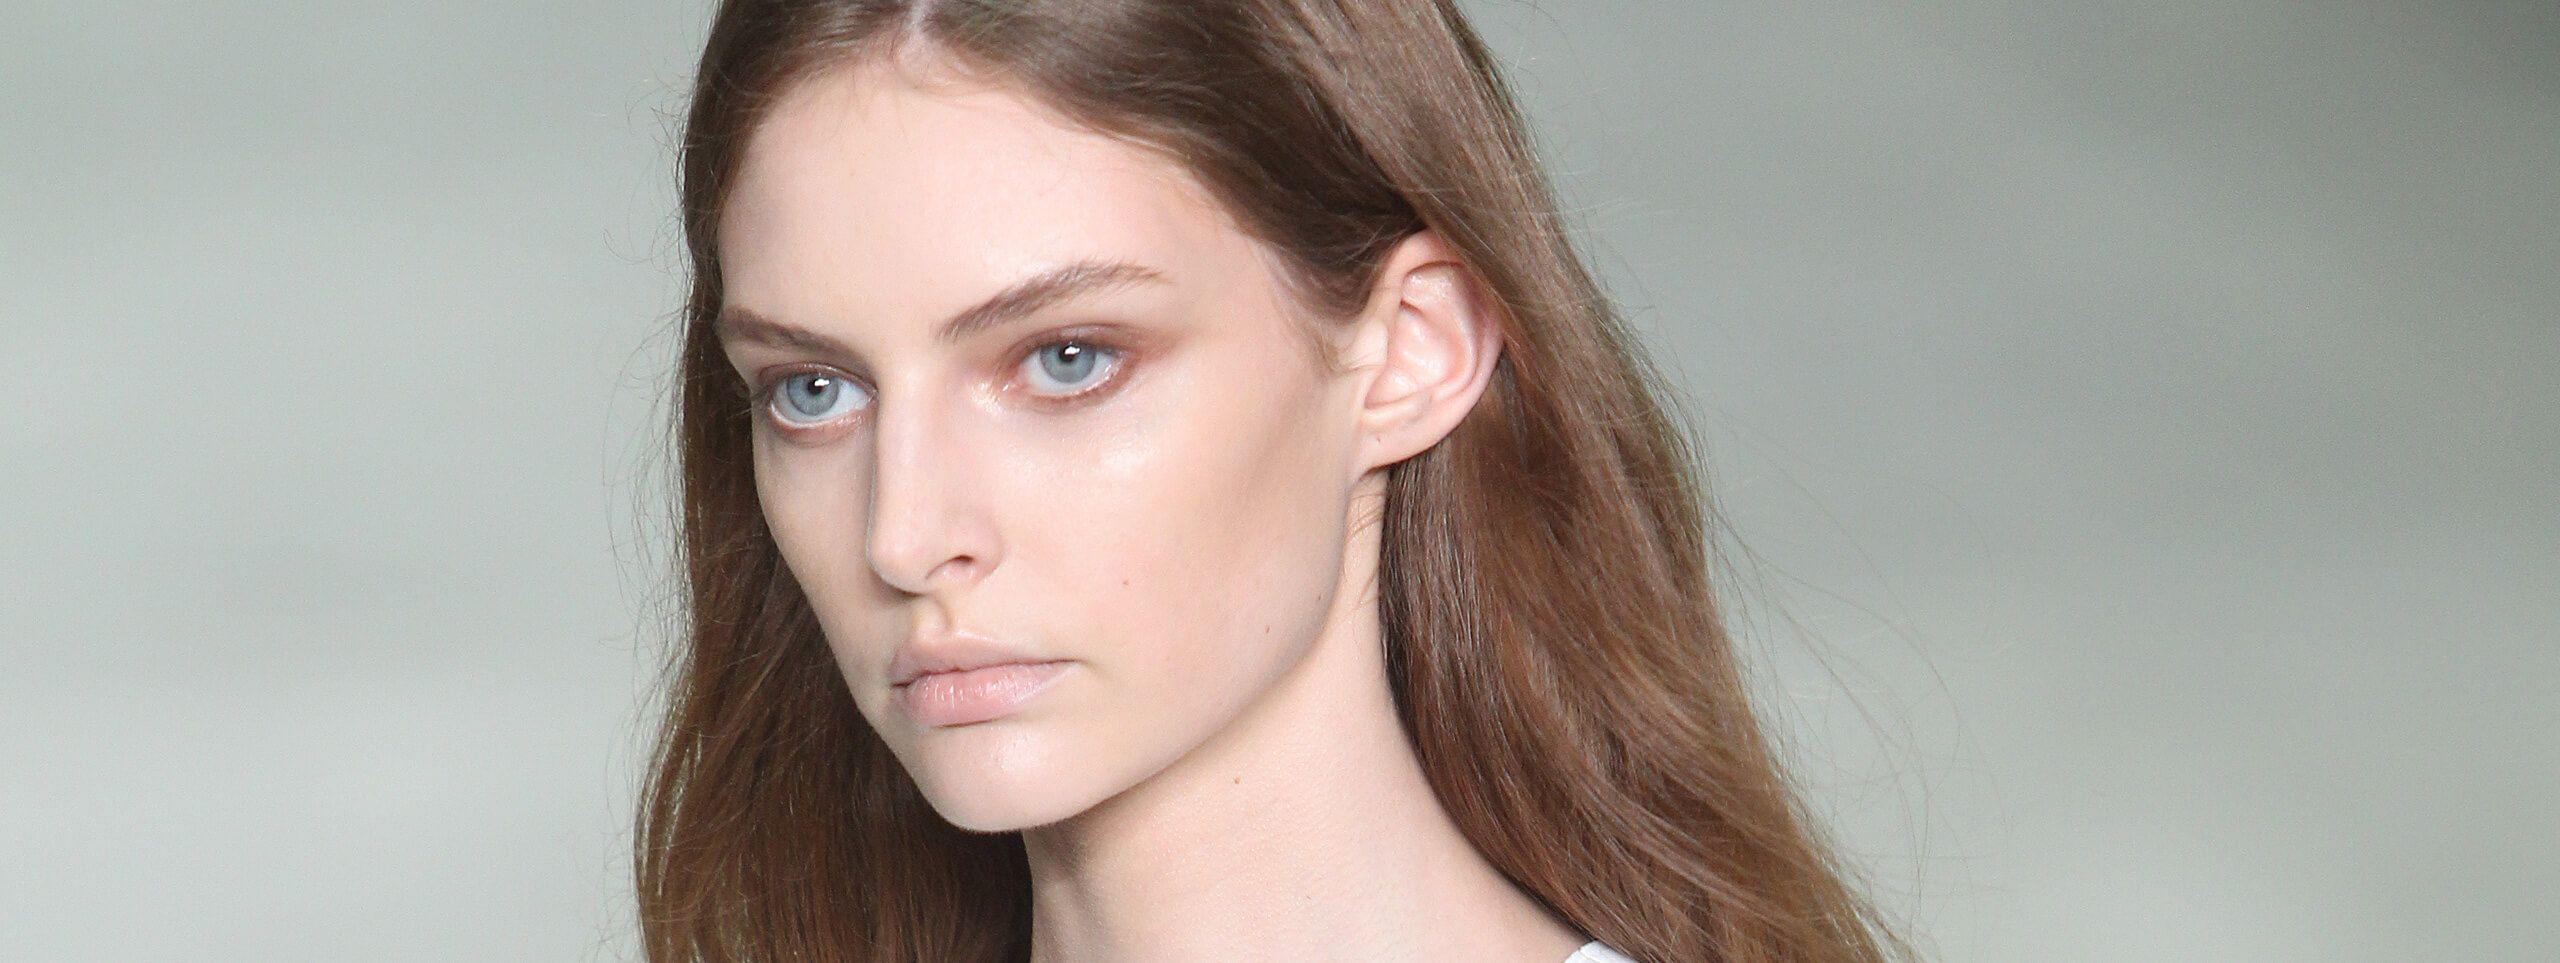 Model rocks cool brown hair color trend